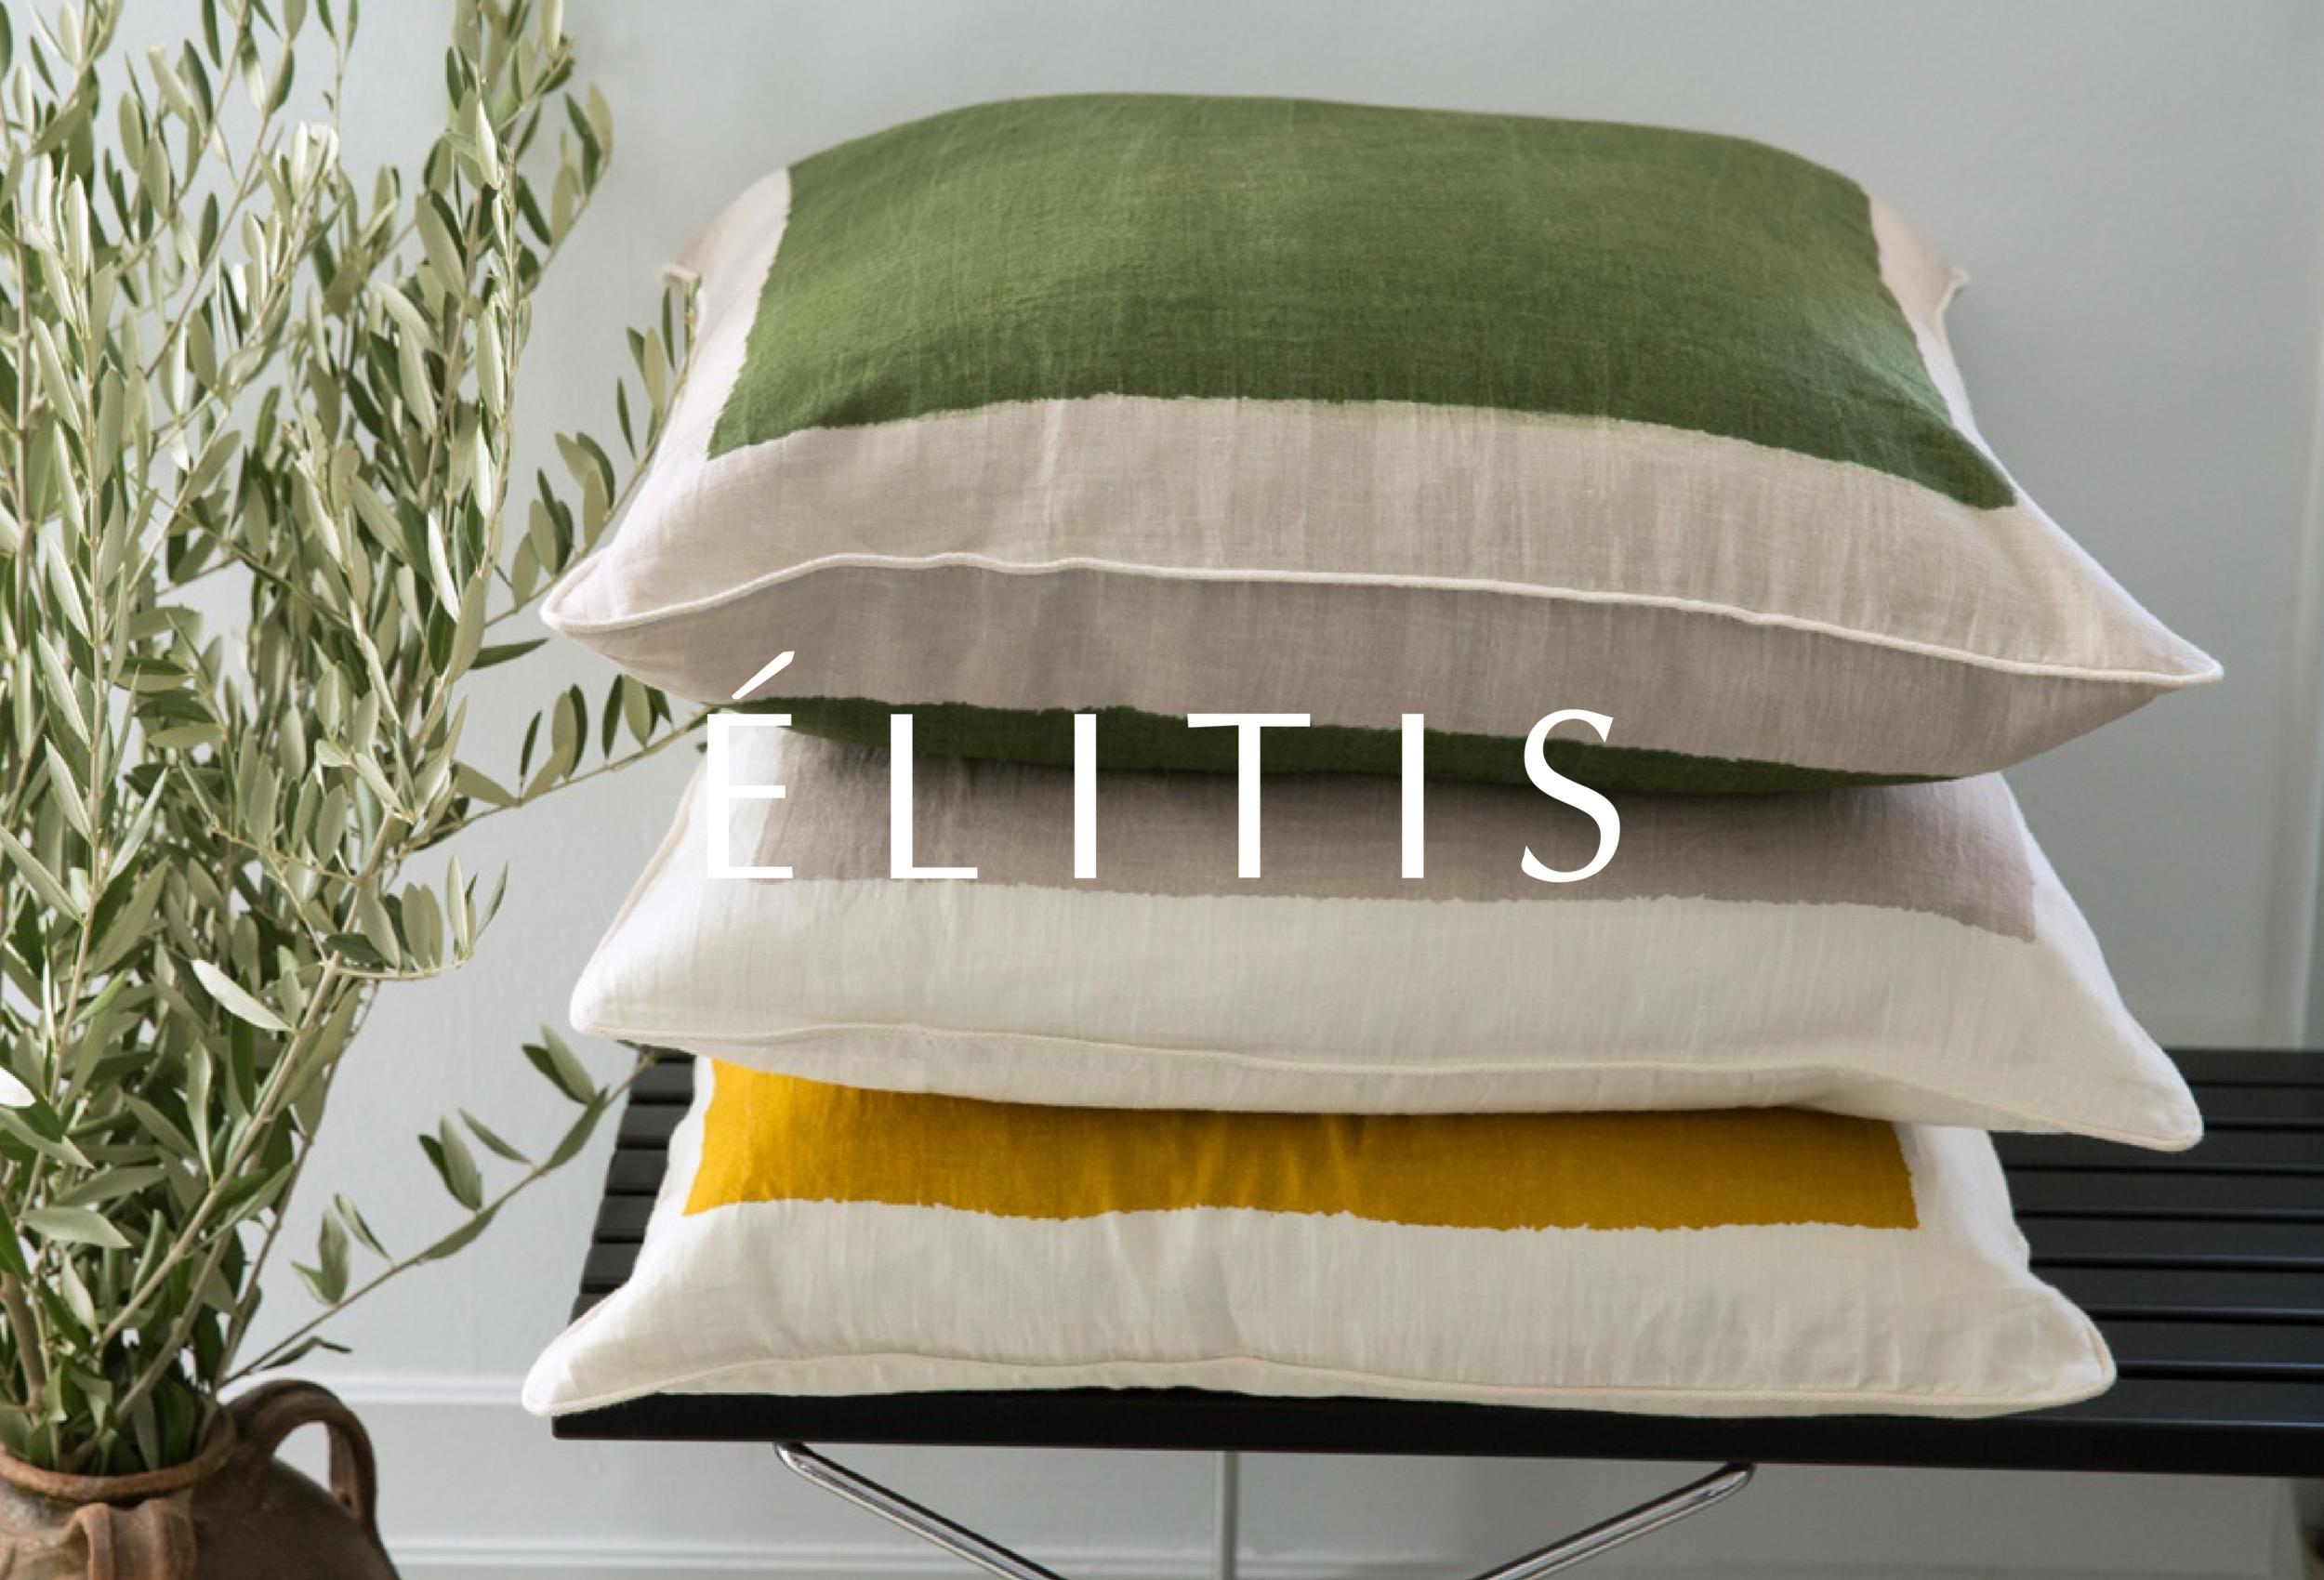 elitis-01.png